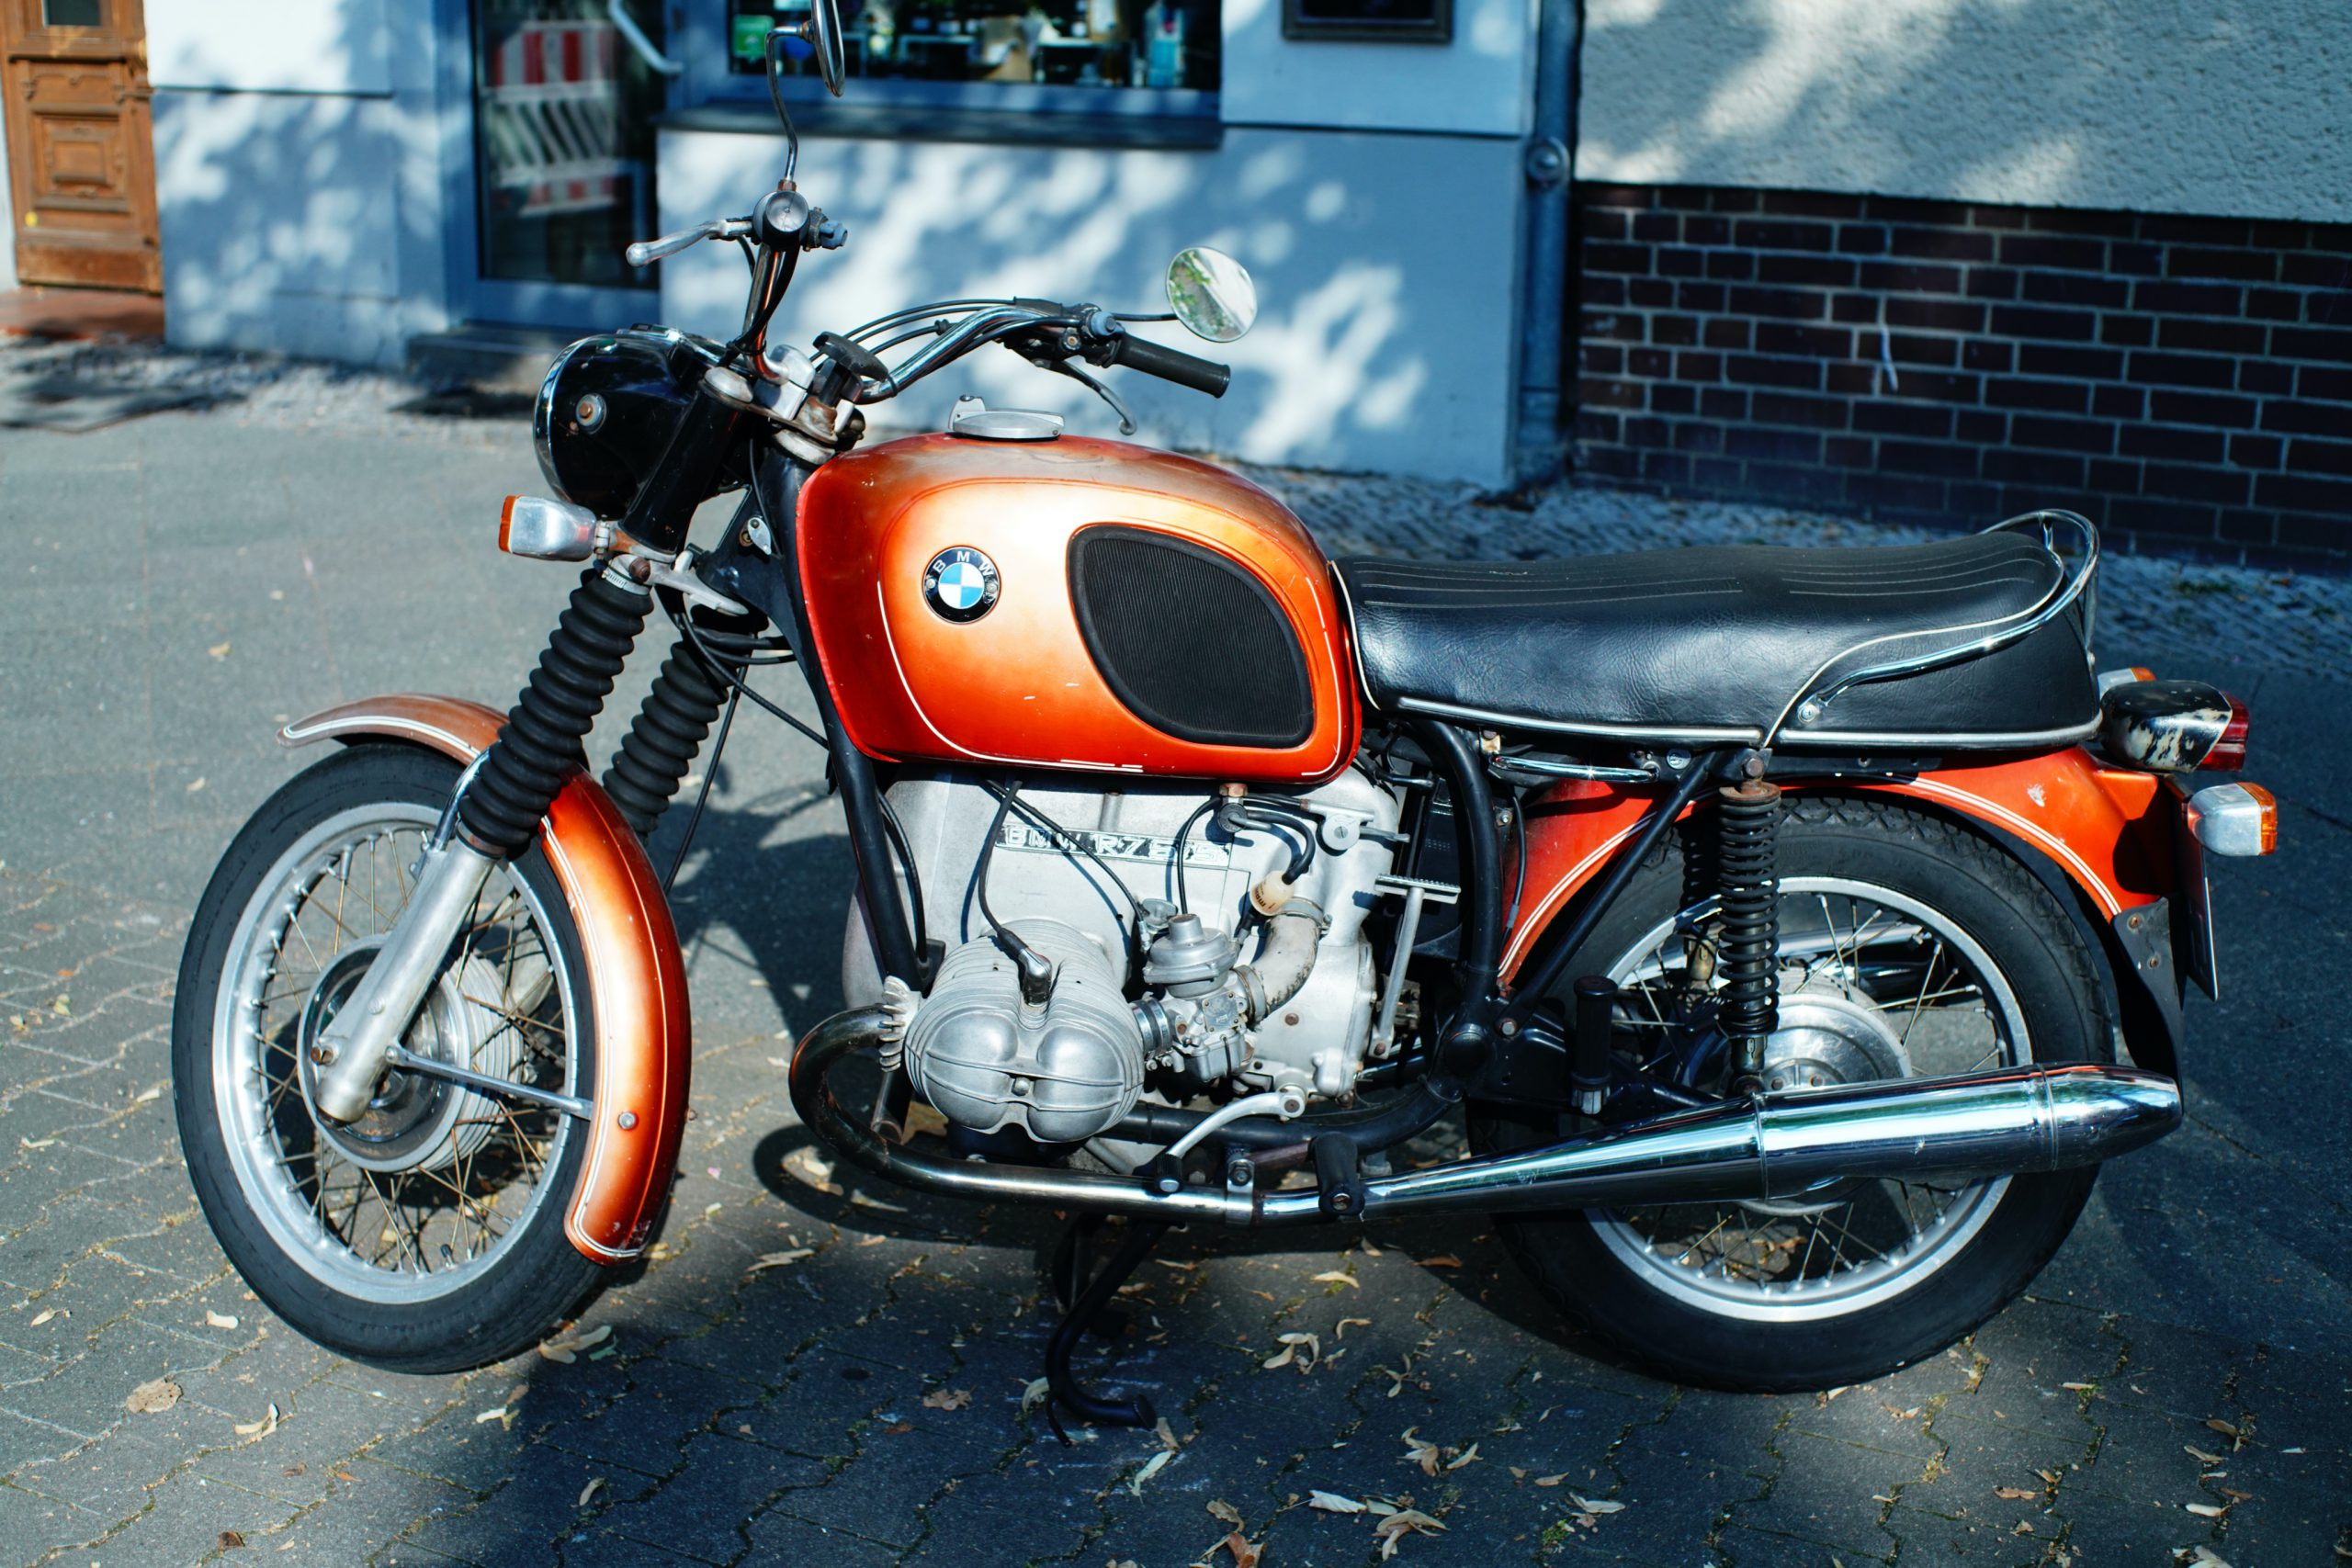 Berlin Bike - Pro Color 5 / A7R IV